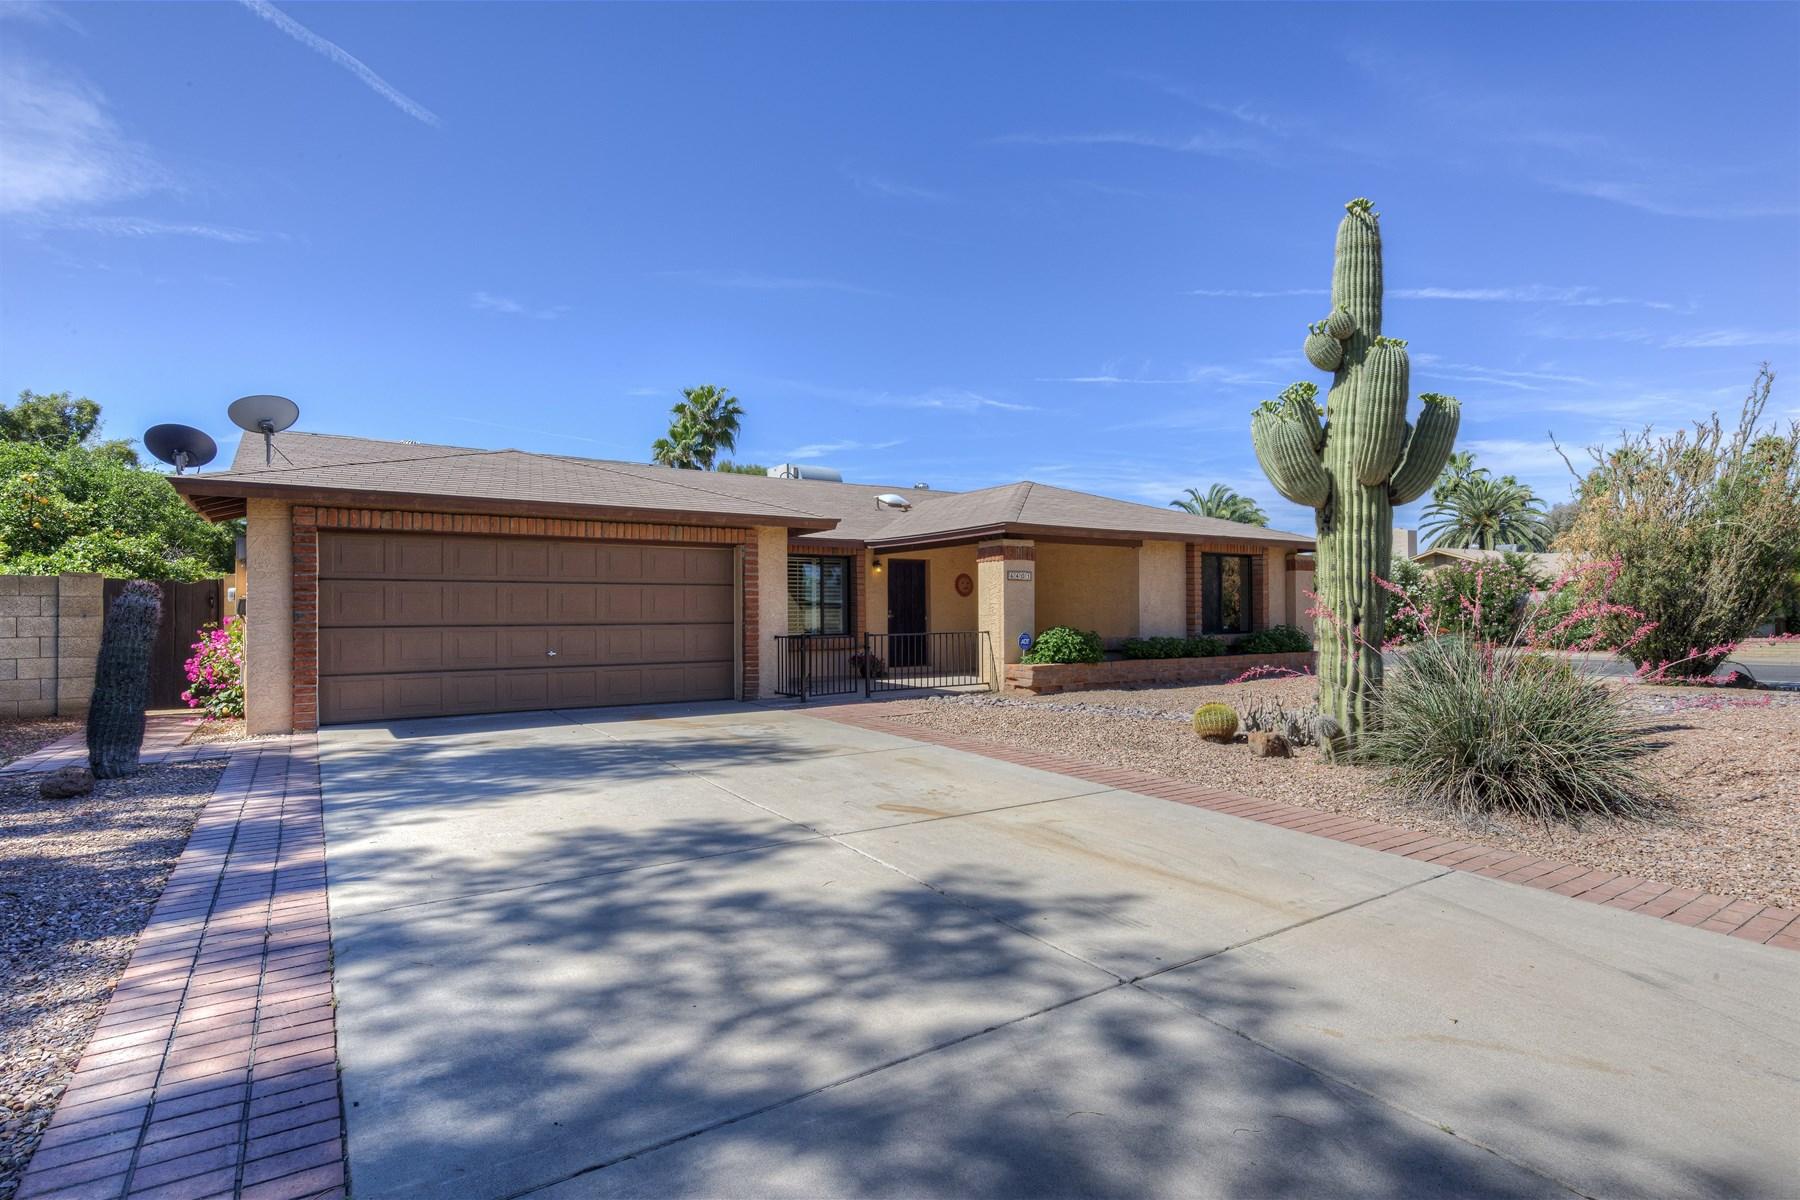 Villa per Vendita alle ore Recently updated in 2015 4401 E SHEENA DR Phoenix, Arizona 85032 Stati Uniti